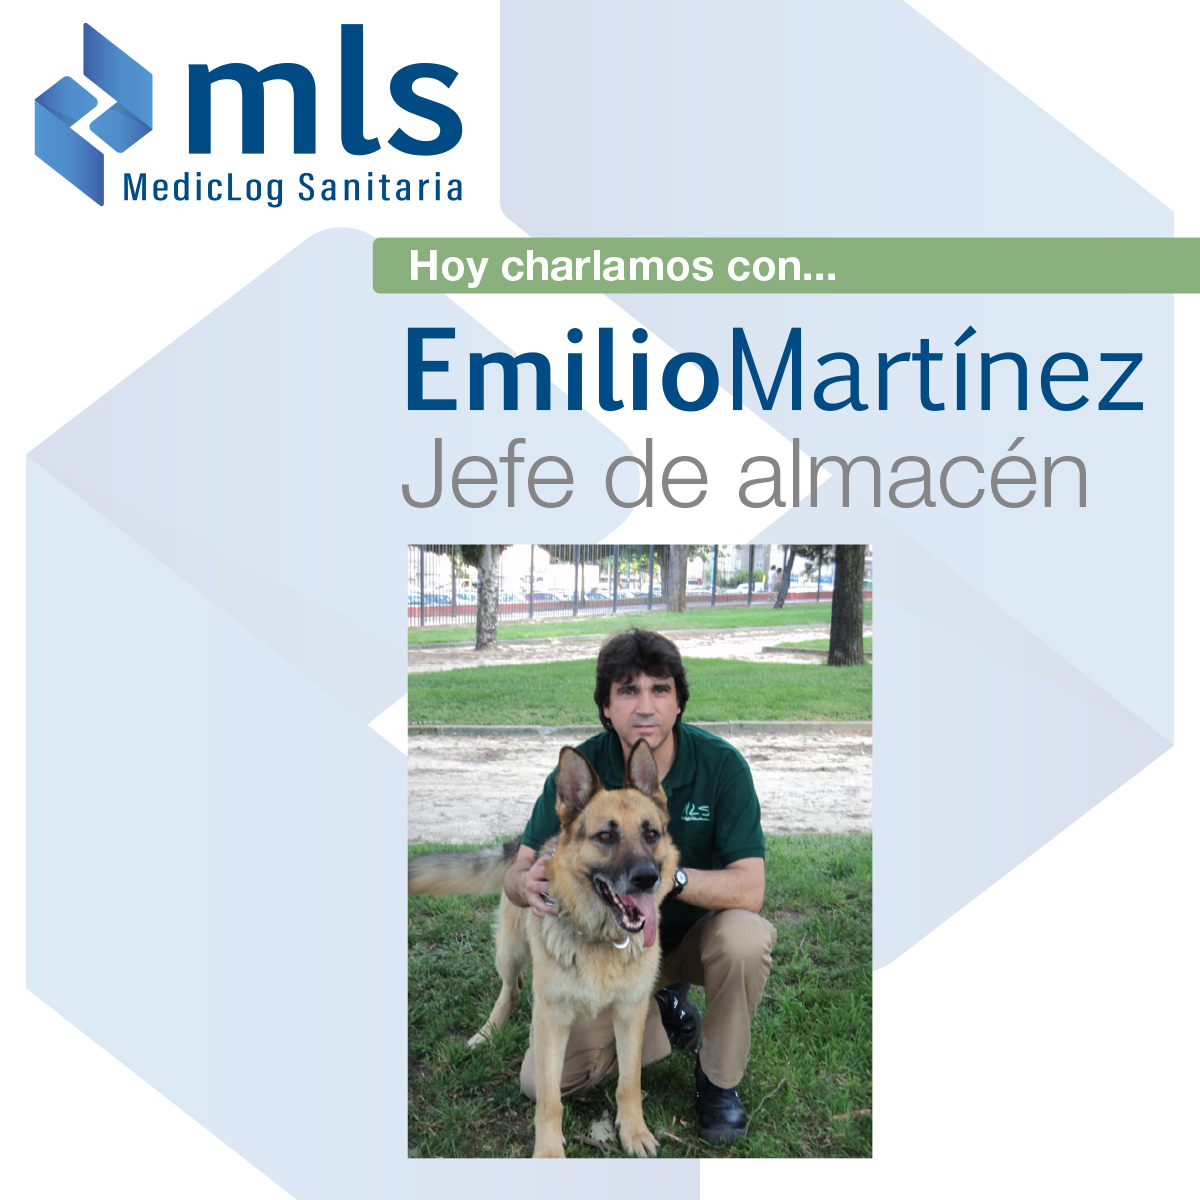 Emilio Martínez de MLS